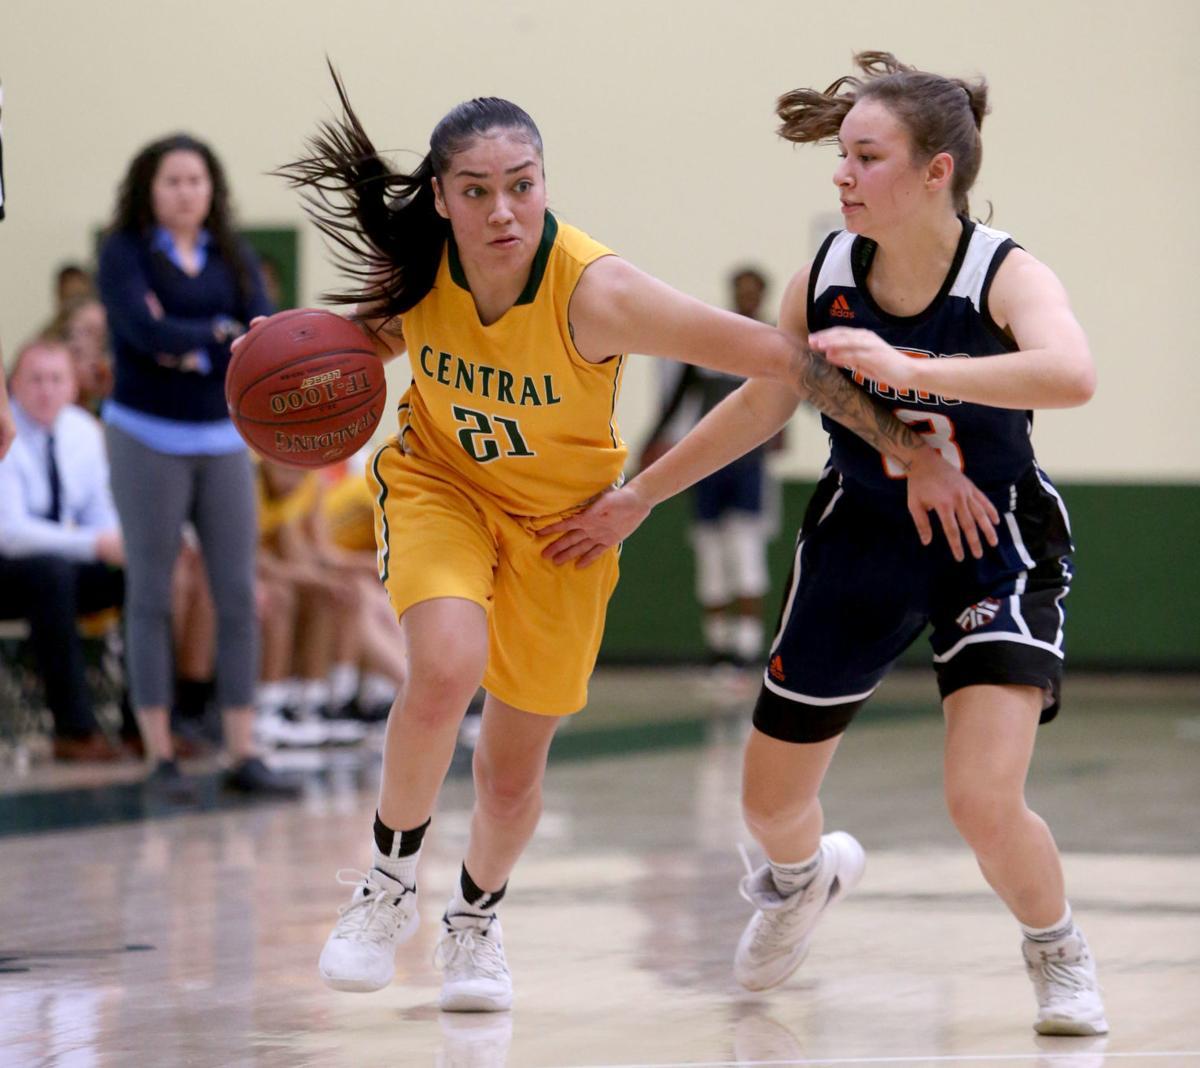 Central vs. Pima women's basketball